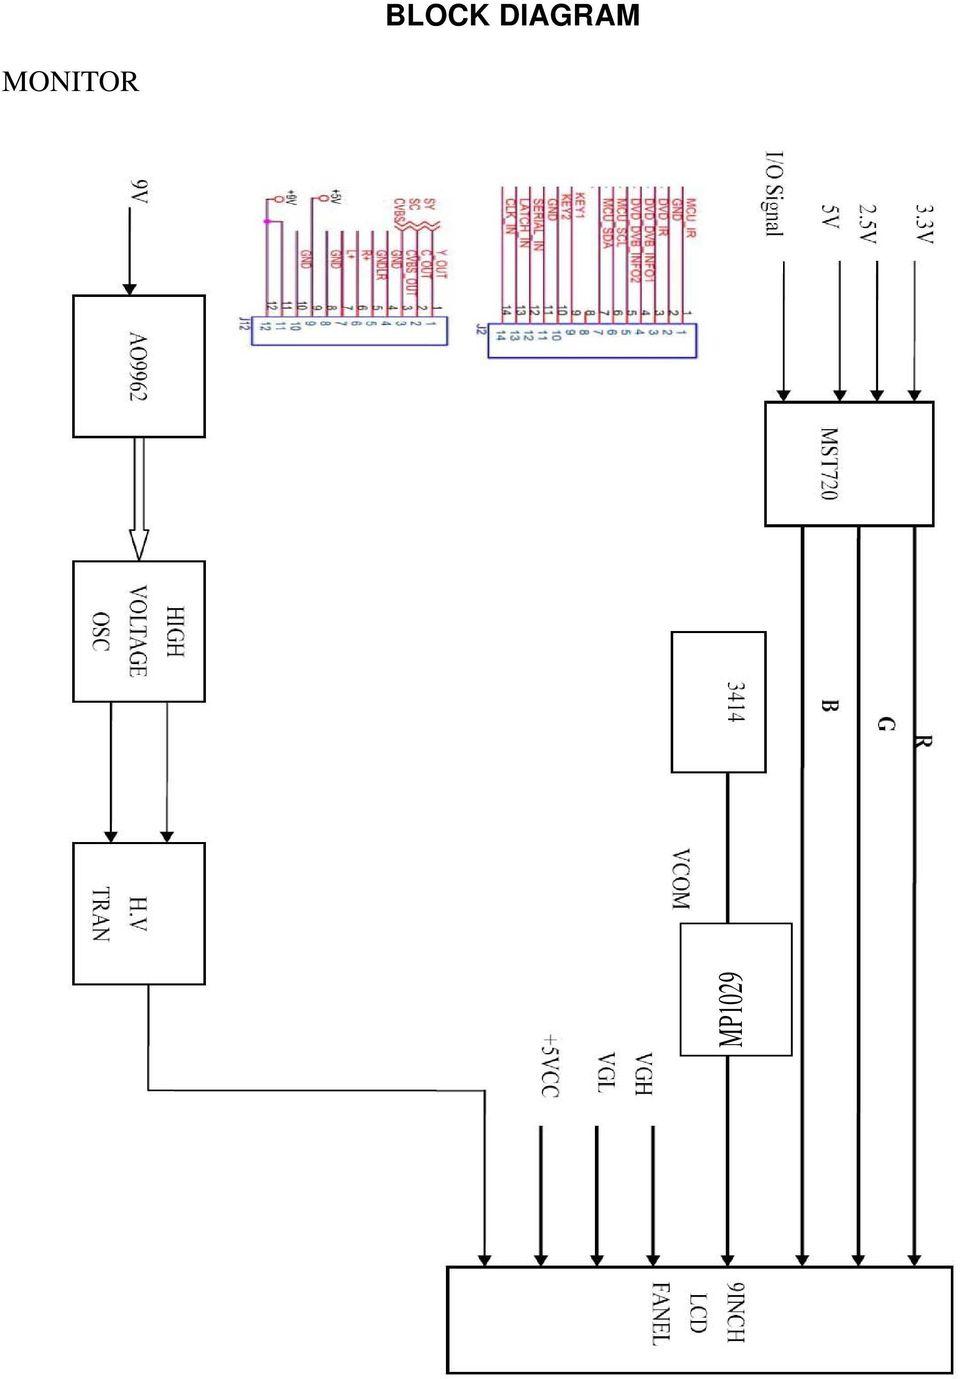 medium resolution of monitor